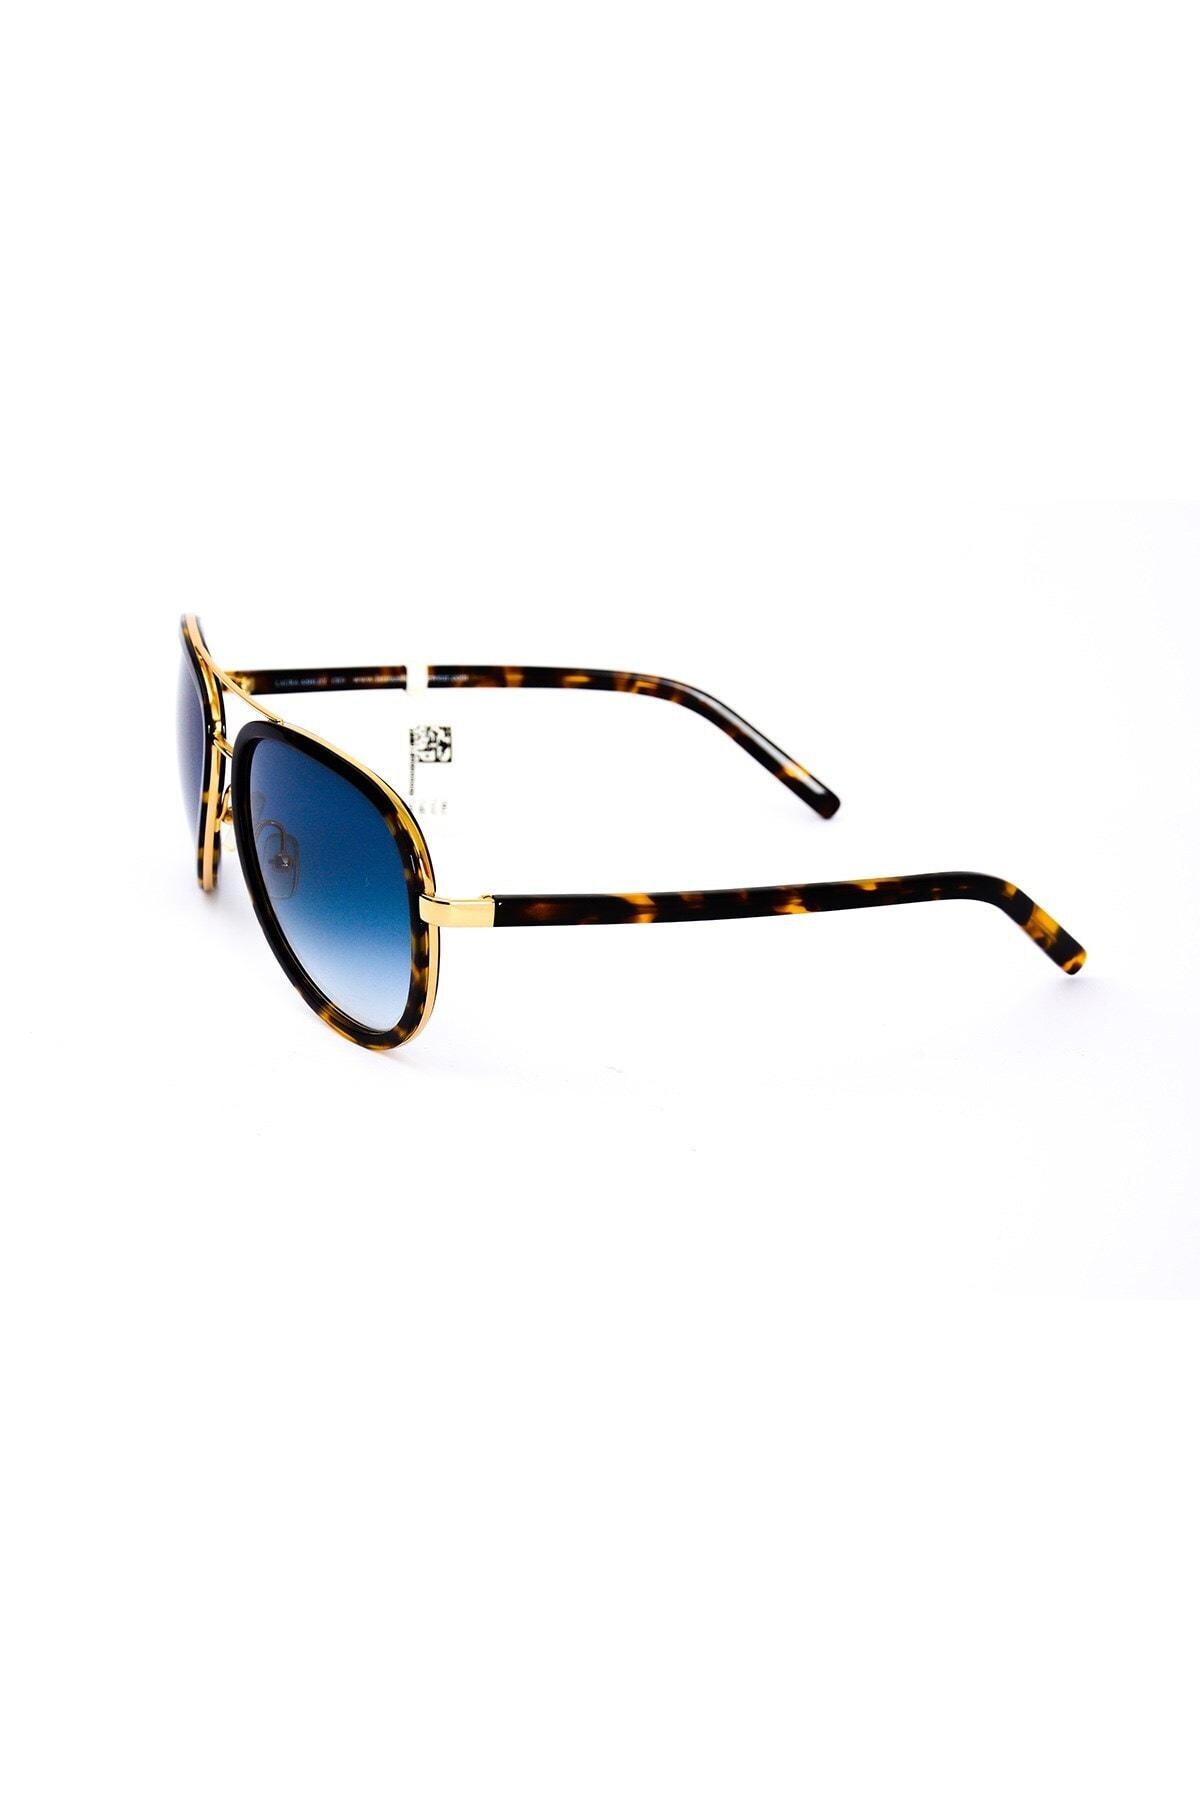 Laura Ashley Unisex Mavi La Troy Güneş Gözlüğü 6 55-18 2